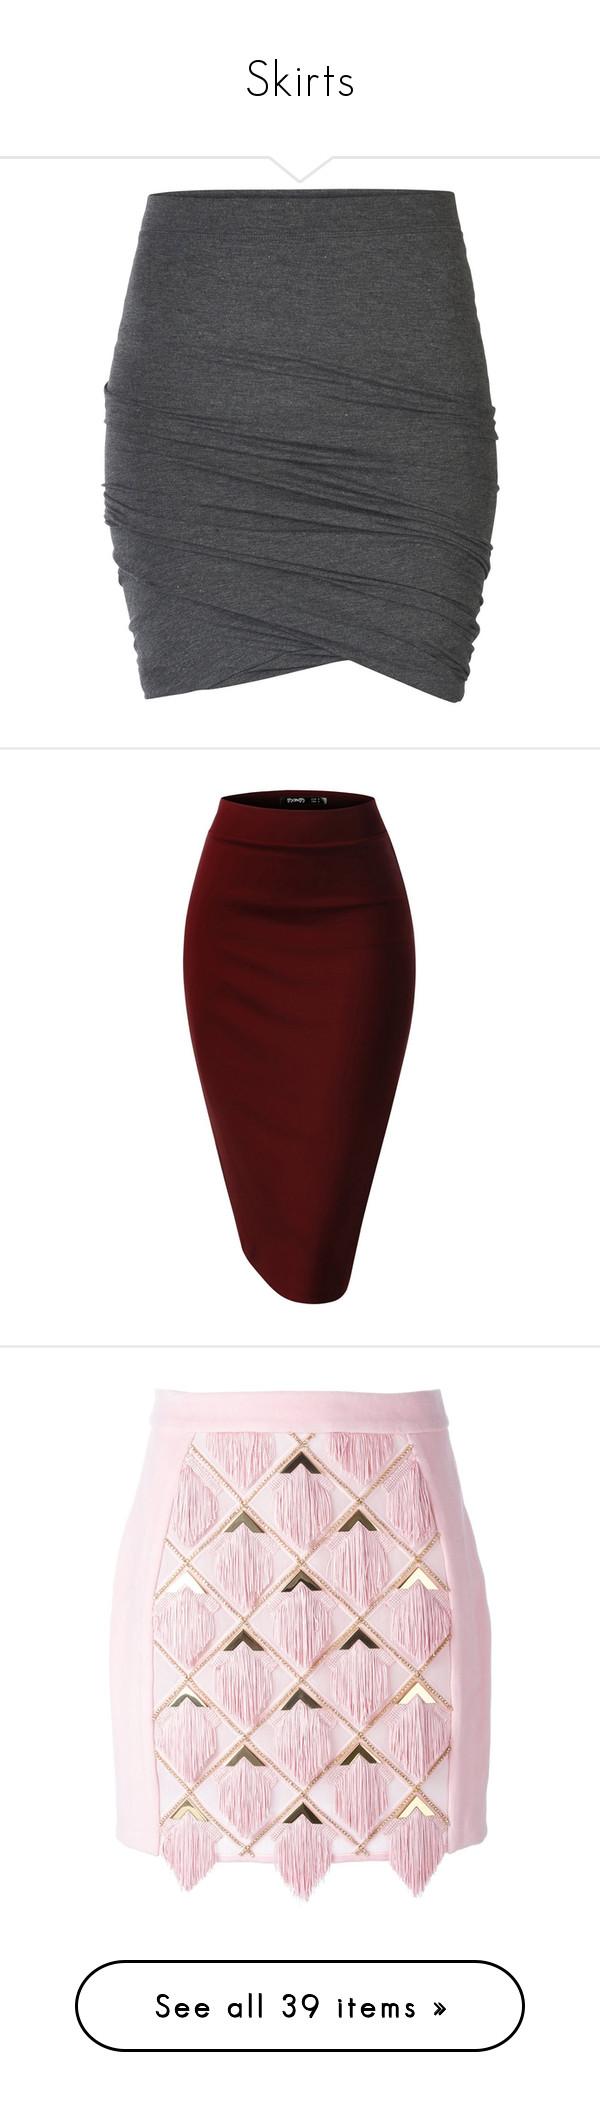 """Skirts"" by riniecias ❤ liked on Polyvore featuring skirts, mini skirts, bottoms, saias, faldas, dark grey melange, short miniskirt, short skirts, short mini skirts and elastic mini skirt"